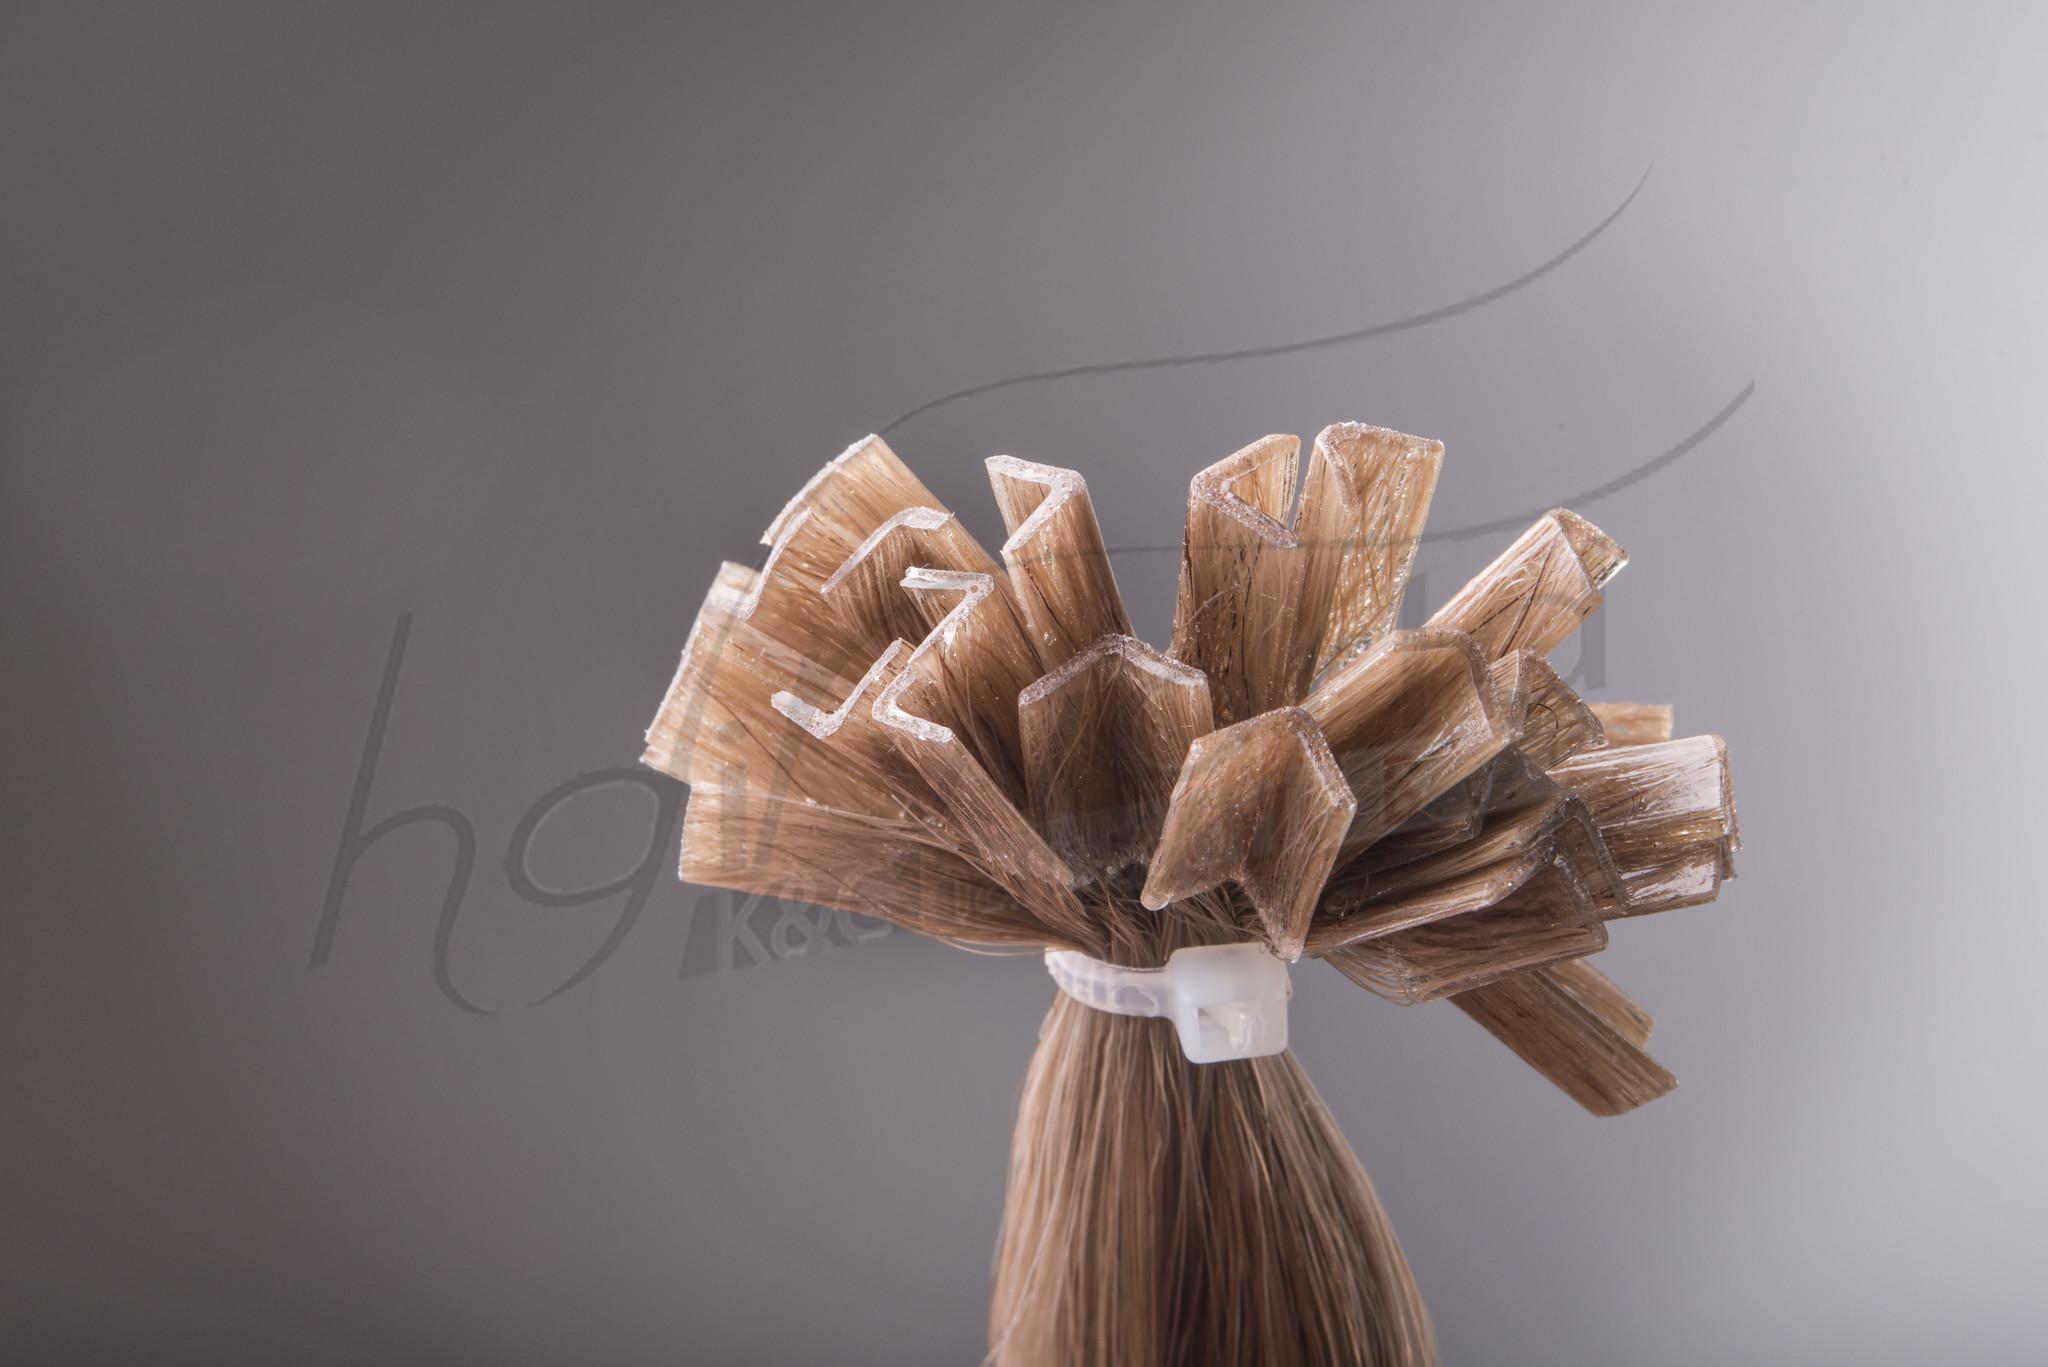 SilverFox Wax Extensions Deep Wave 55cm  #27 Dark Blonde